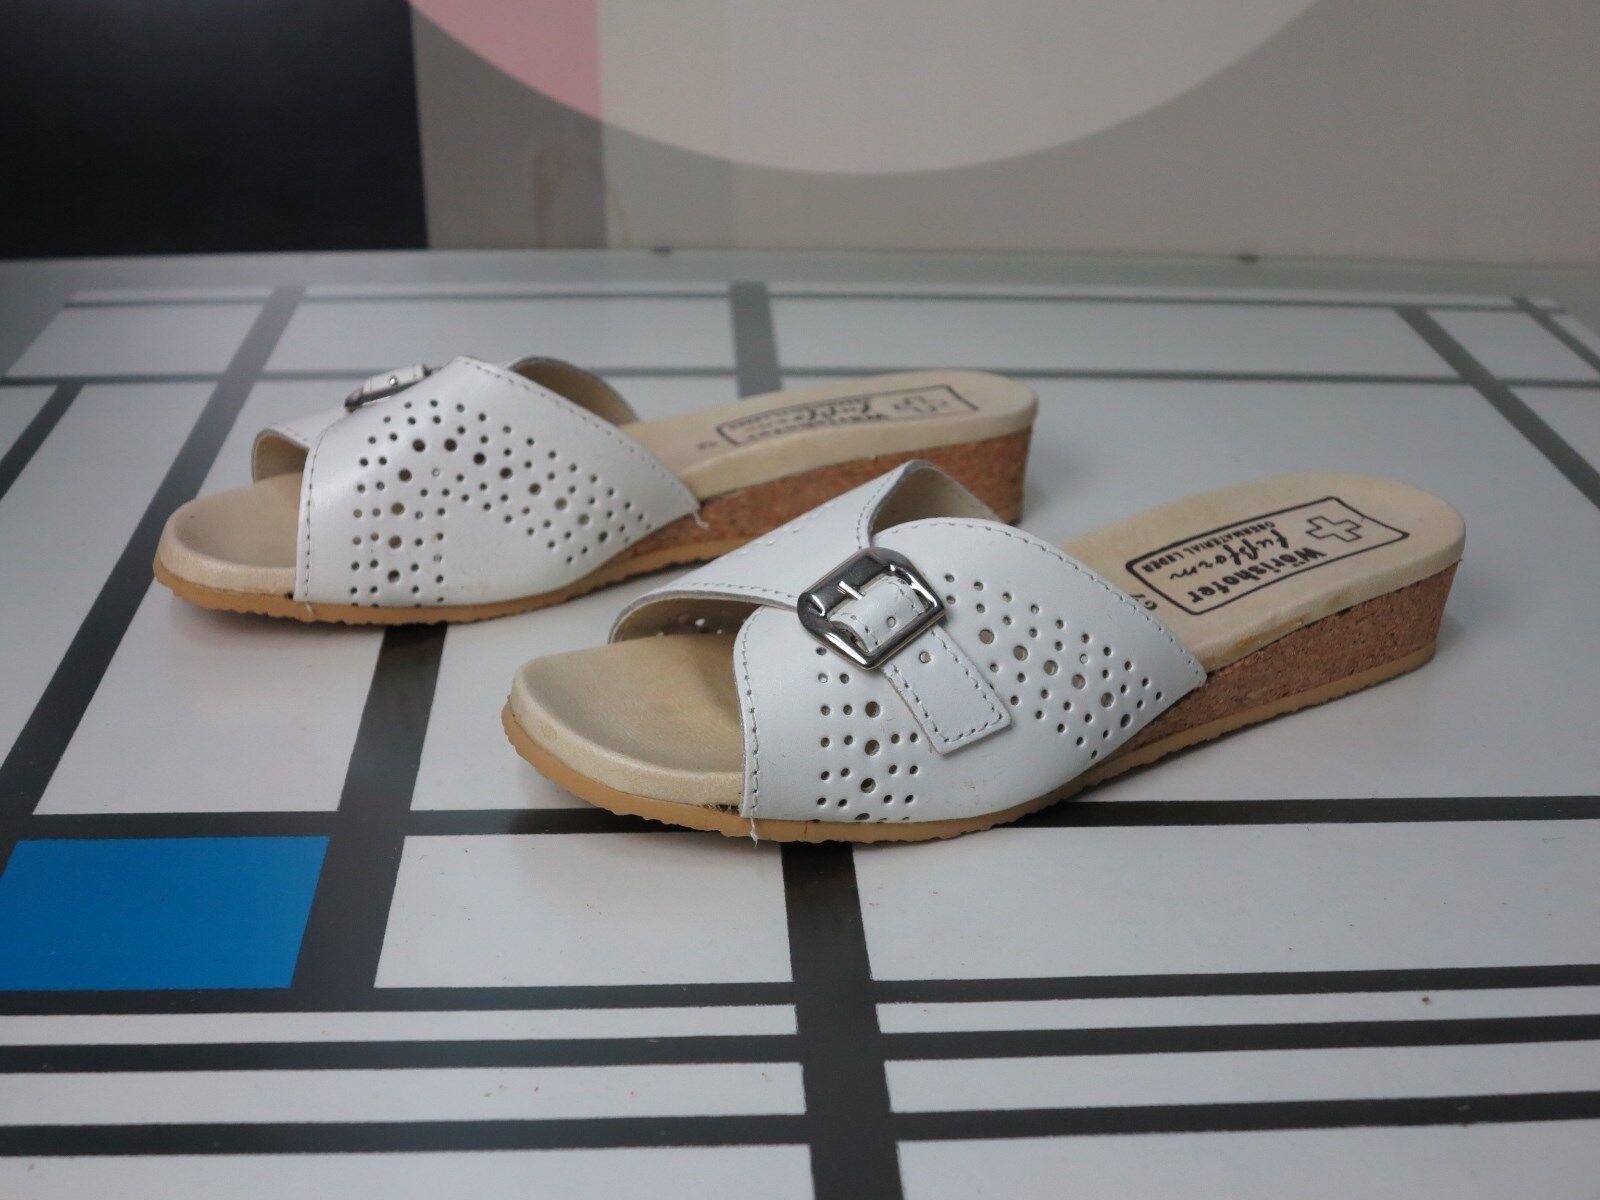 Wörishofer acolchada sandalia badeschuh 42 OVP True vintage Wood sandals Bath zapatos